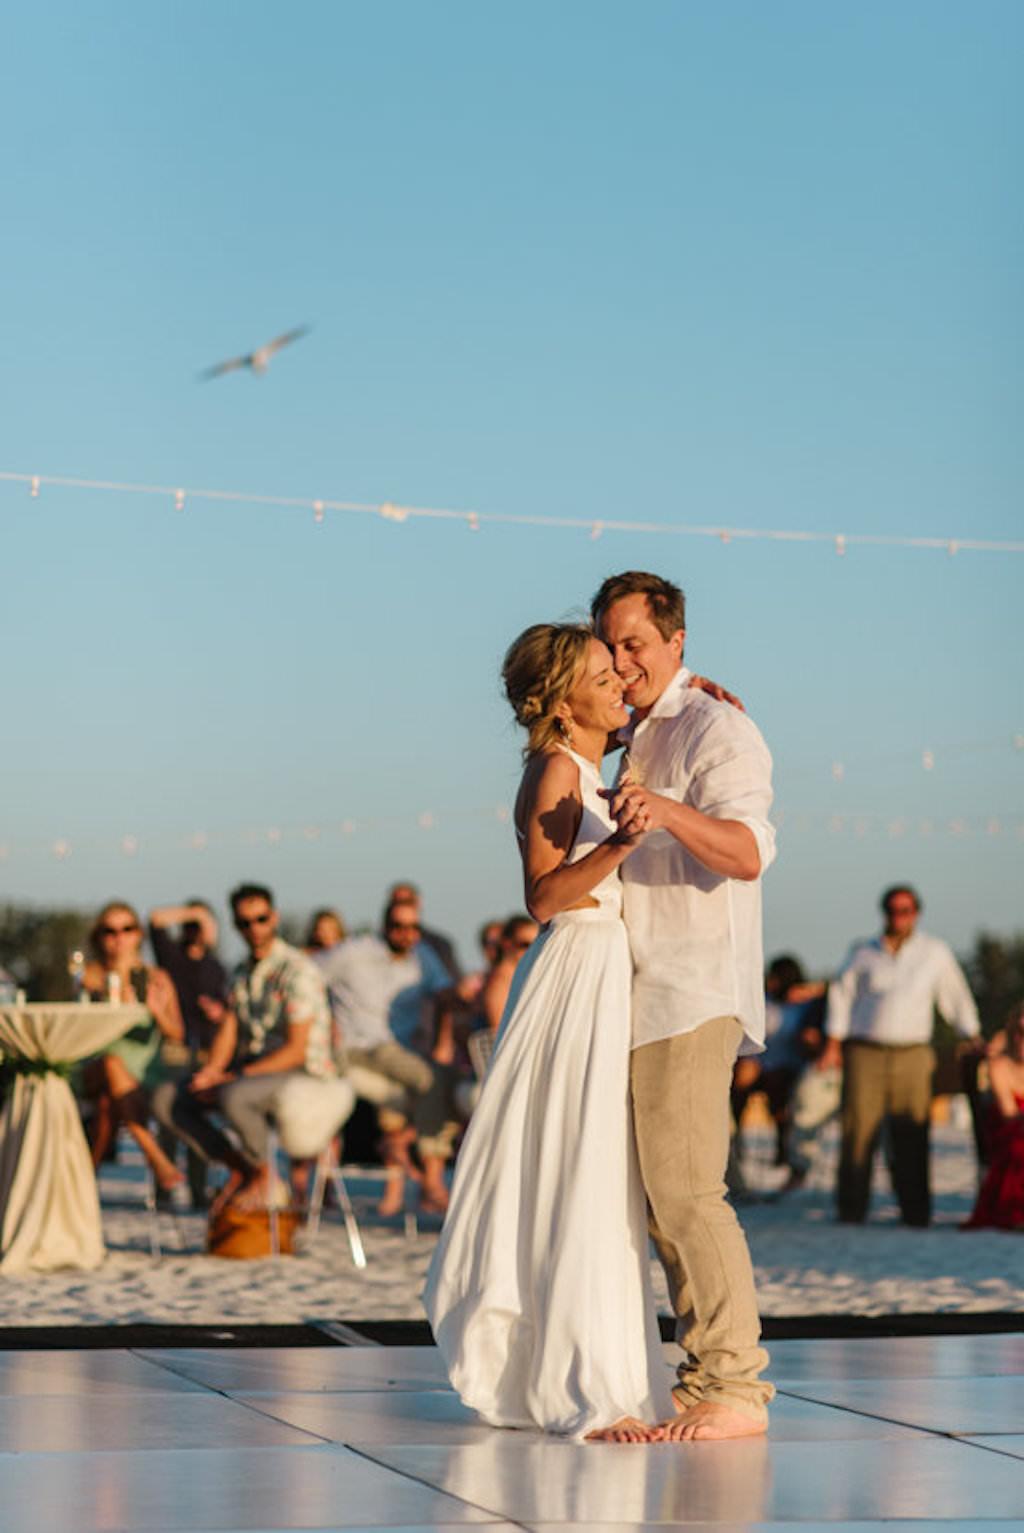 Sarasota Beachfront Bride and Groom Barefoot First Dance Wedding Portrait | Resort at Longboat Key Club Waterfront Beach Wedding Venue